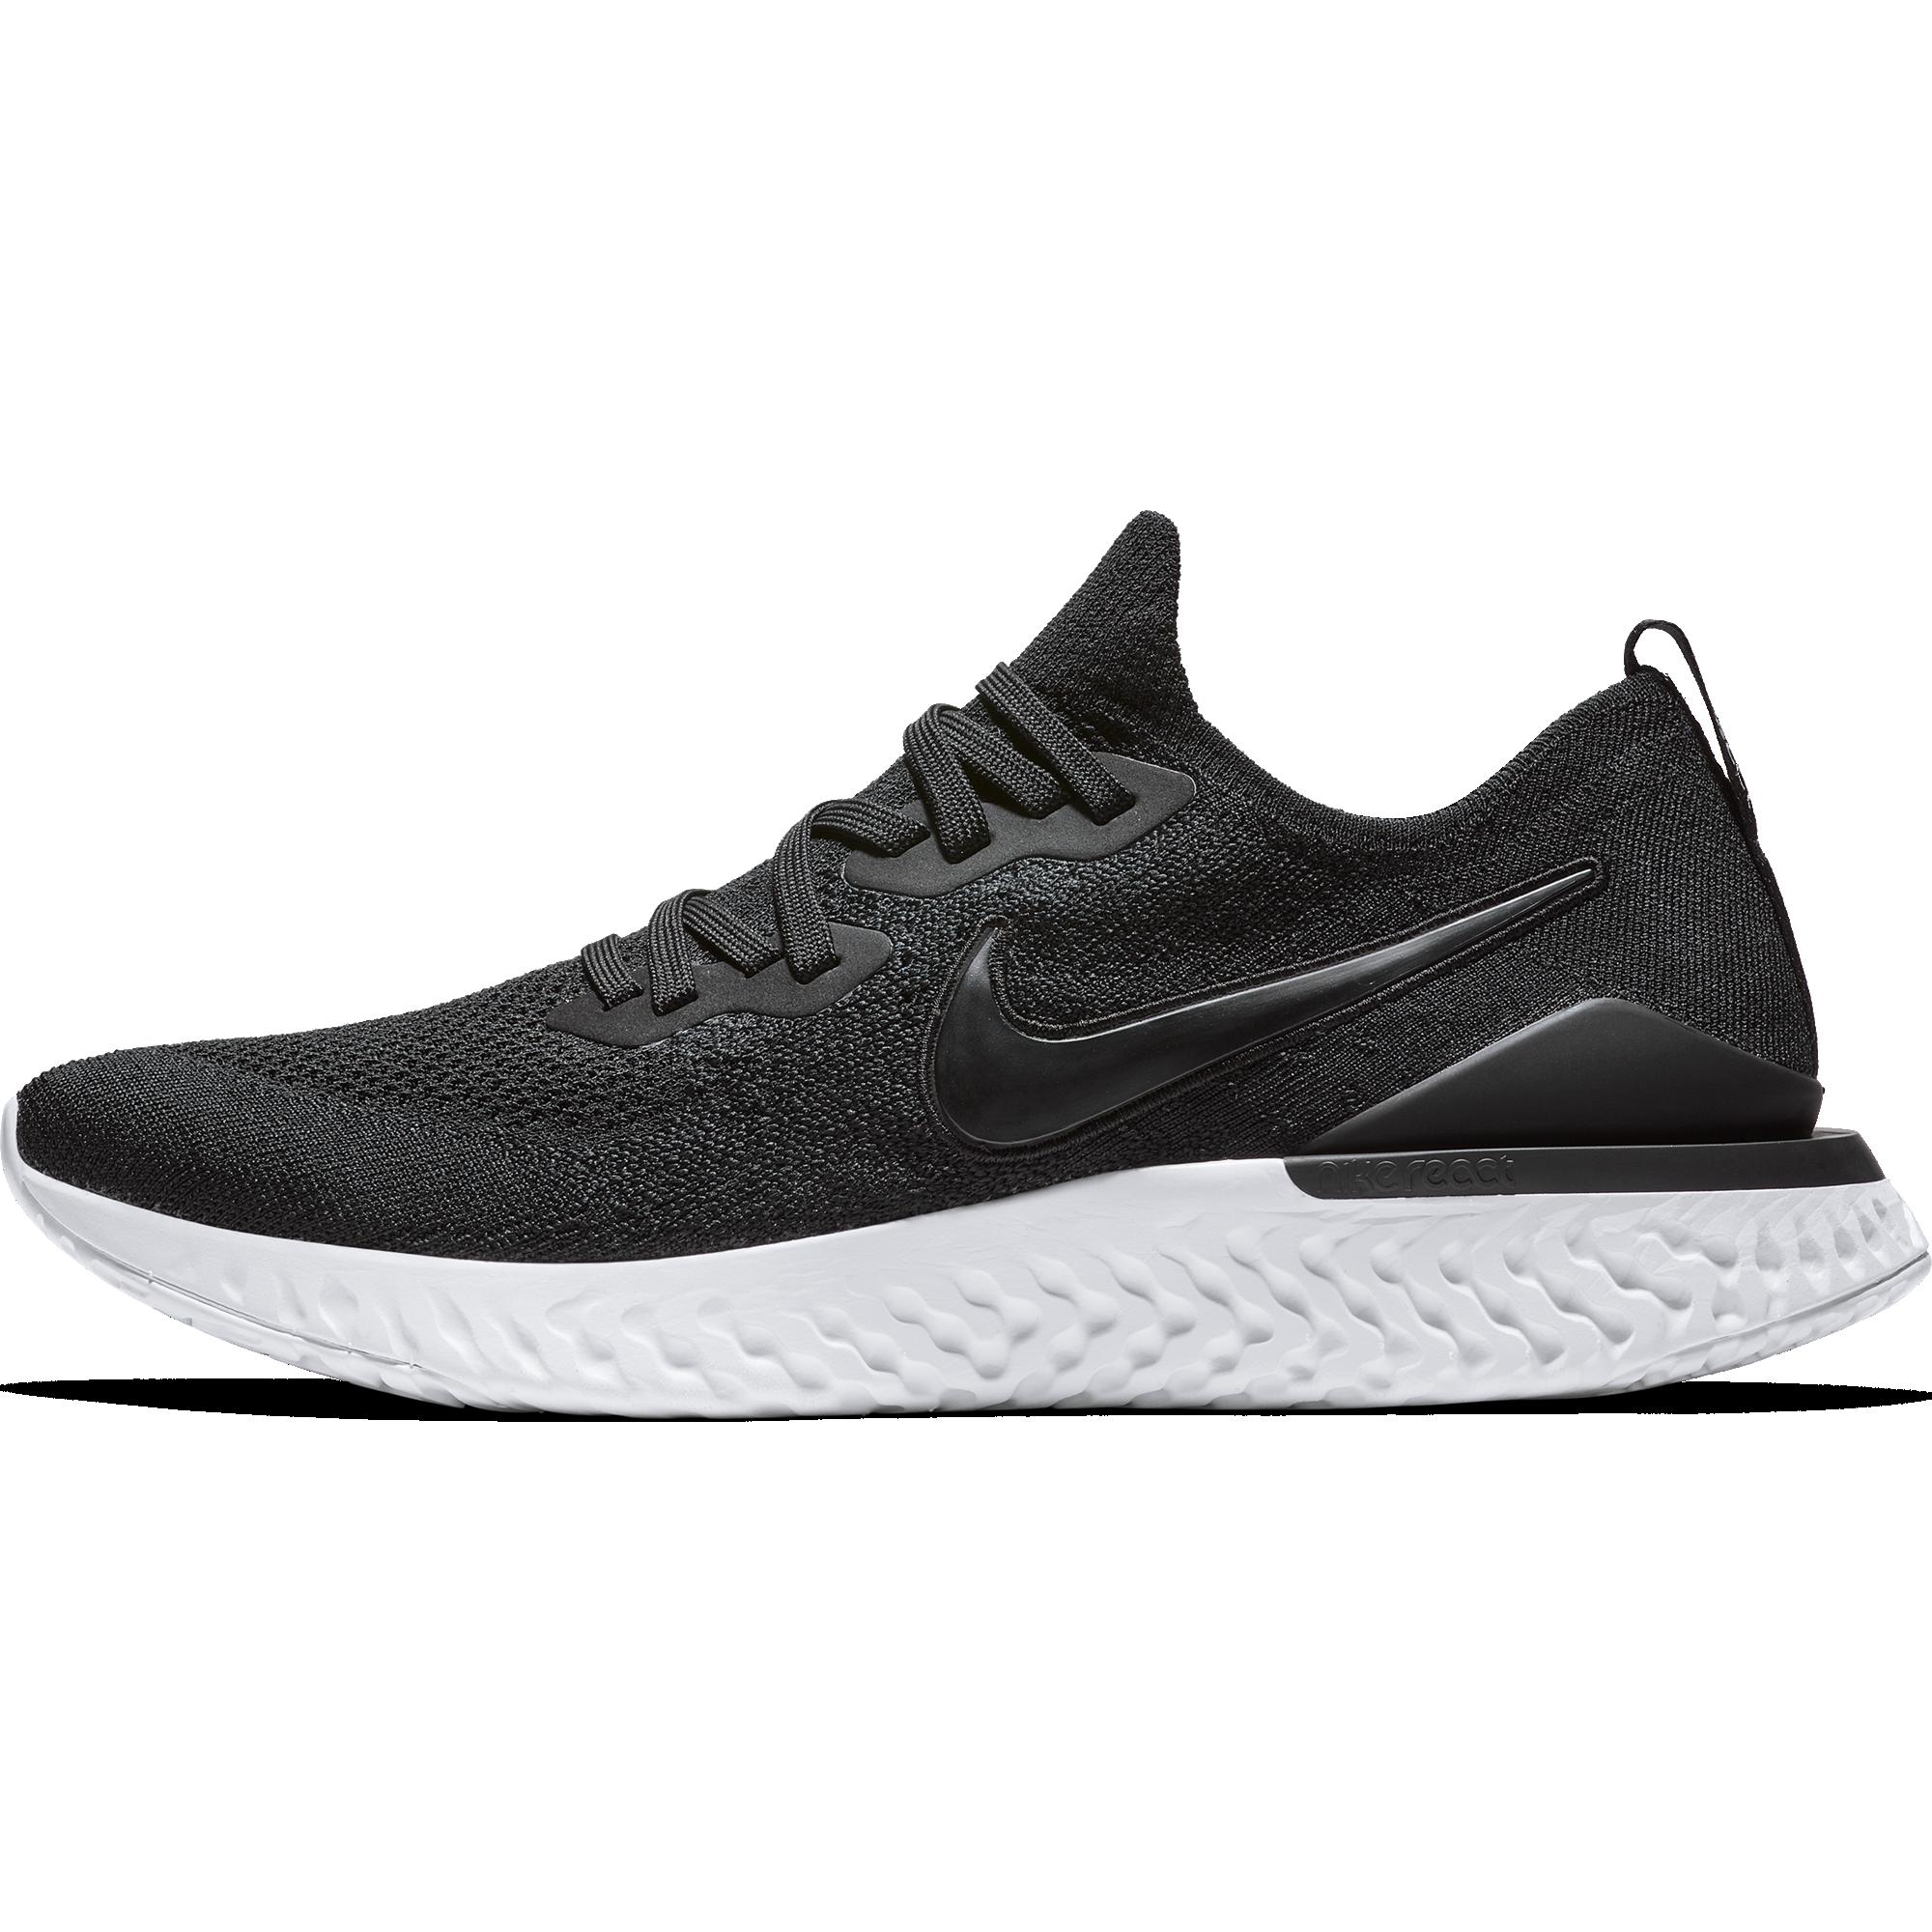 f680b329980b9 Nike Epic React Flyknit 2 - BLK WHT - Culture Athletics